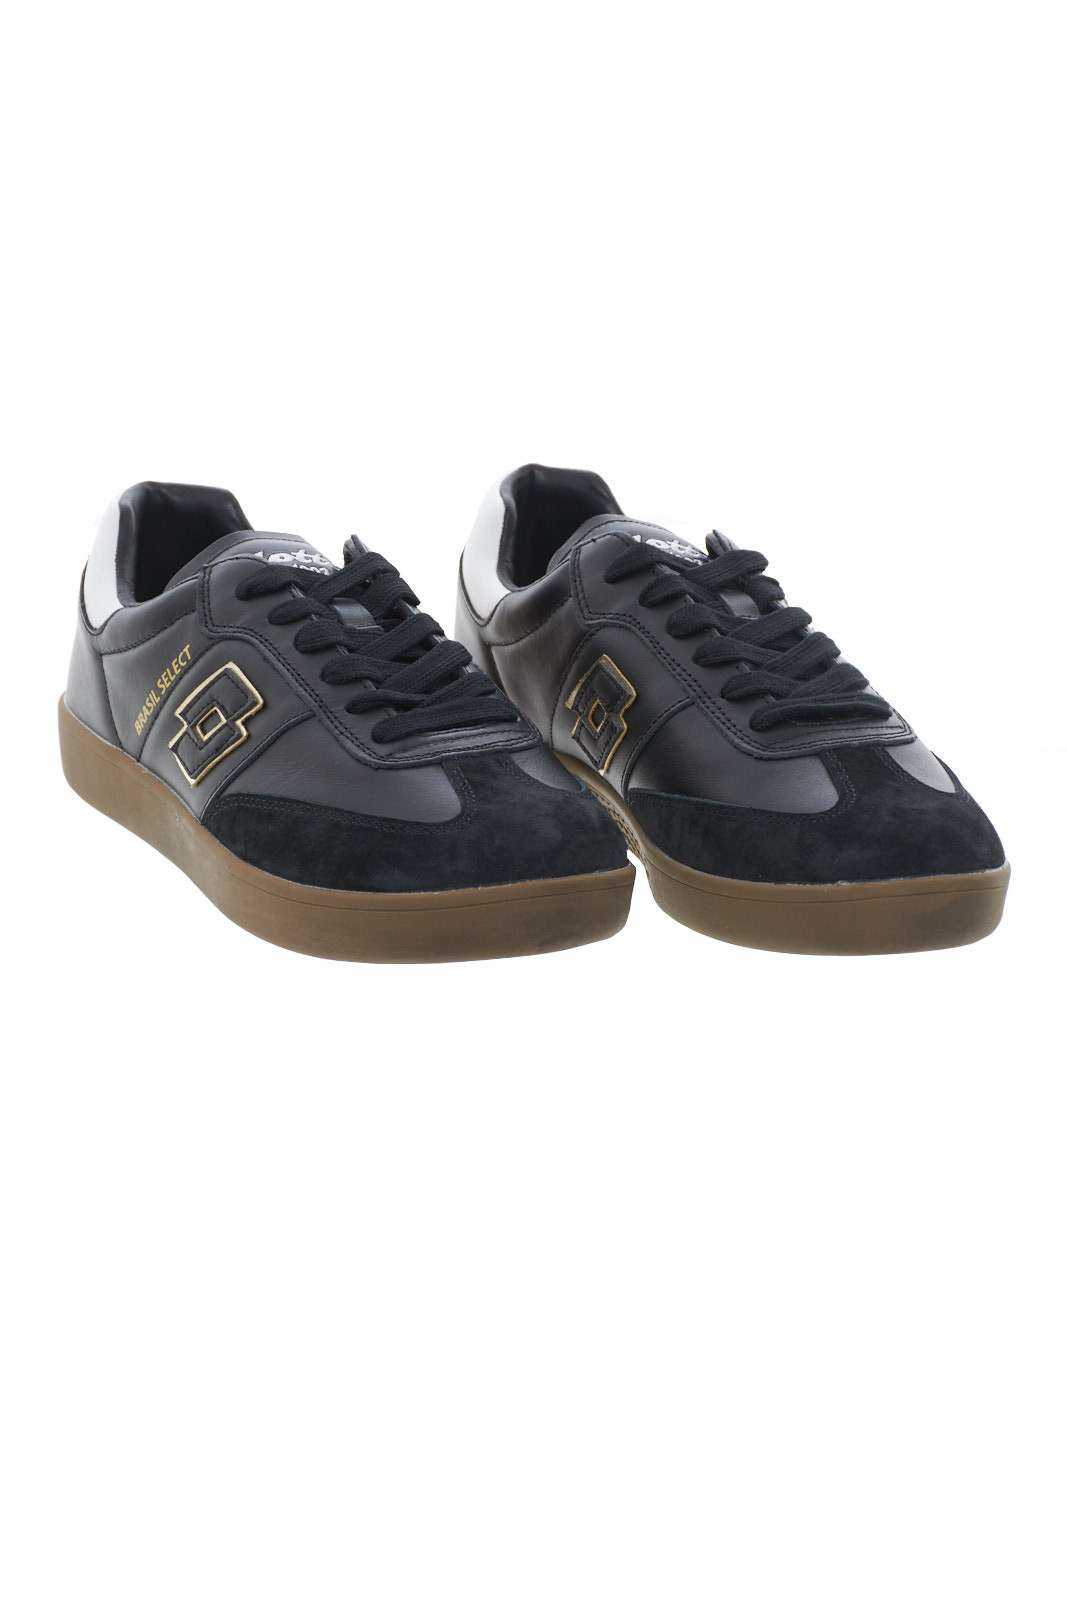 https://www.parmax.com/media/catalog/product/a/i/ai-outlet_parmax-sneaker-lotto-t7364-b_2.jpg